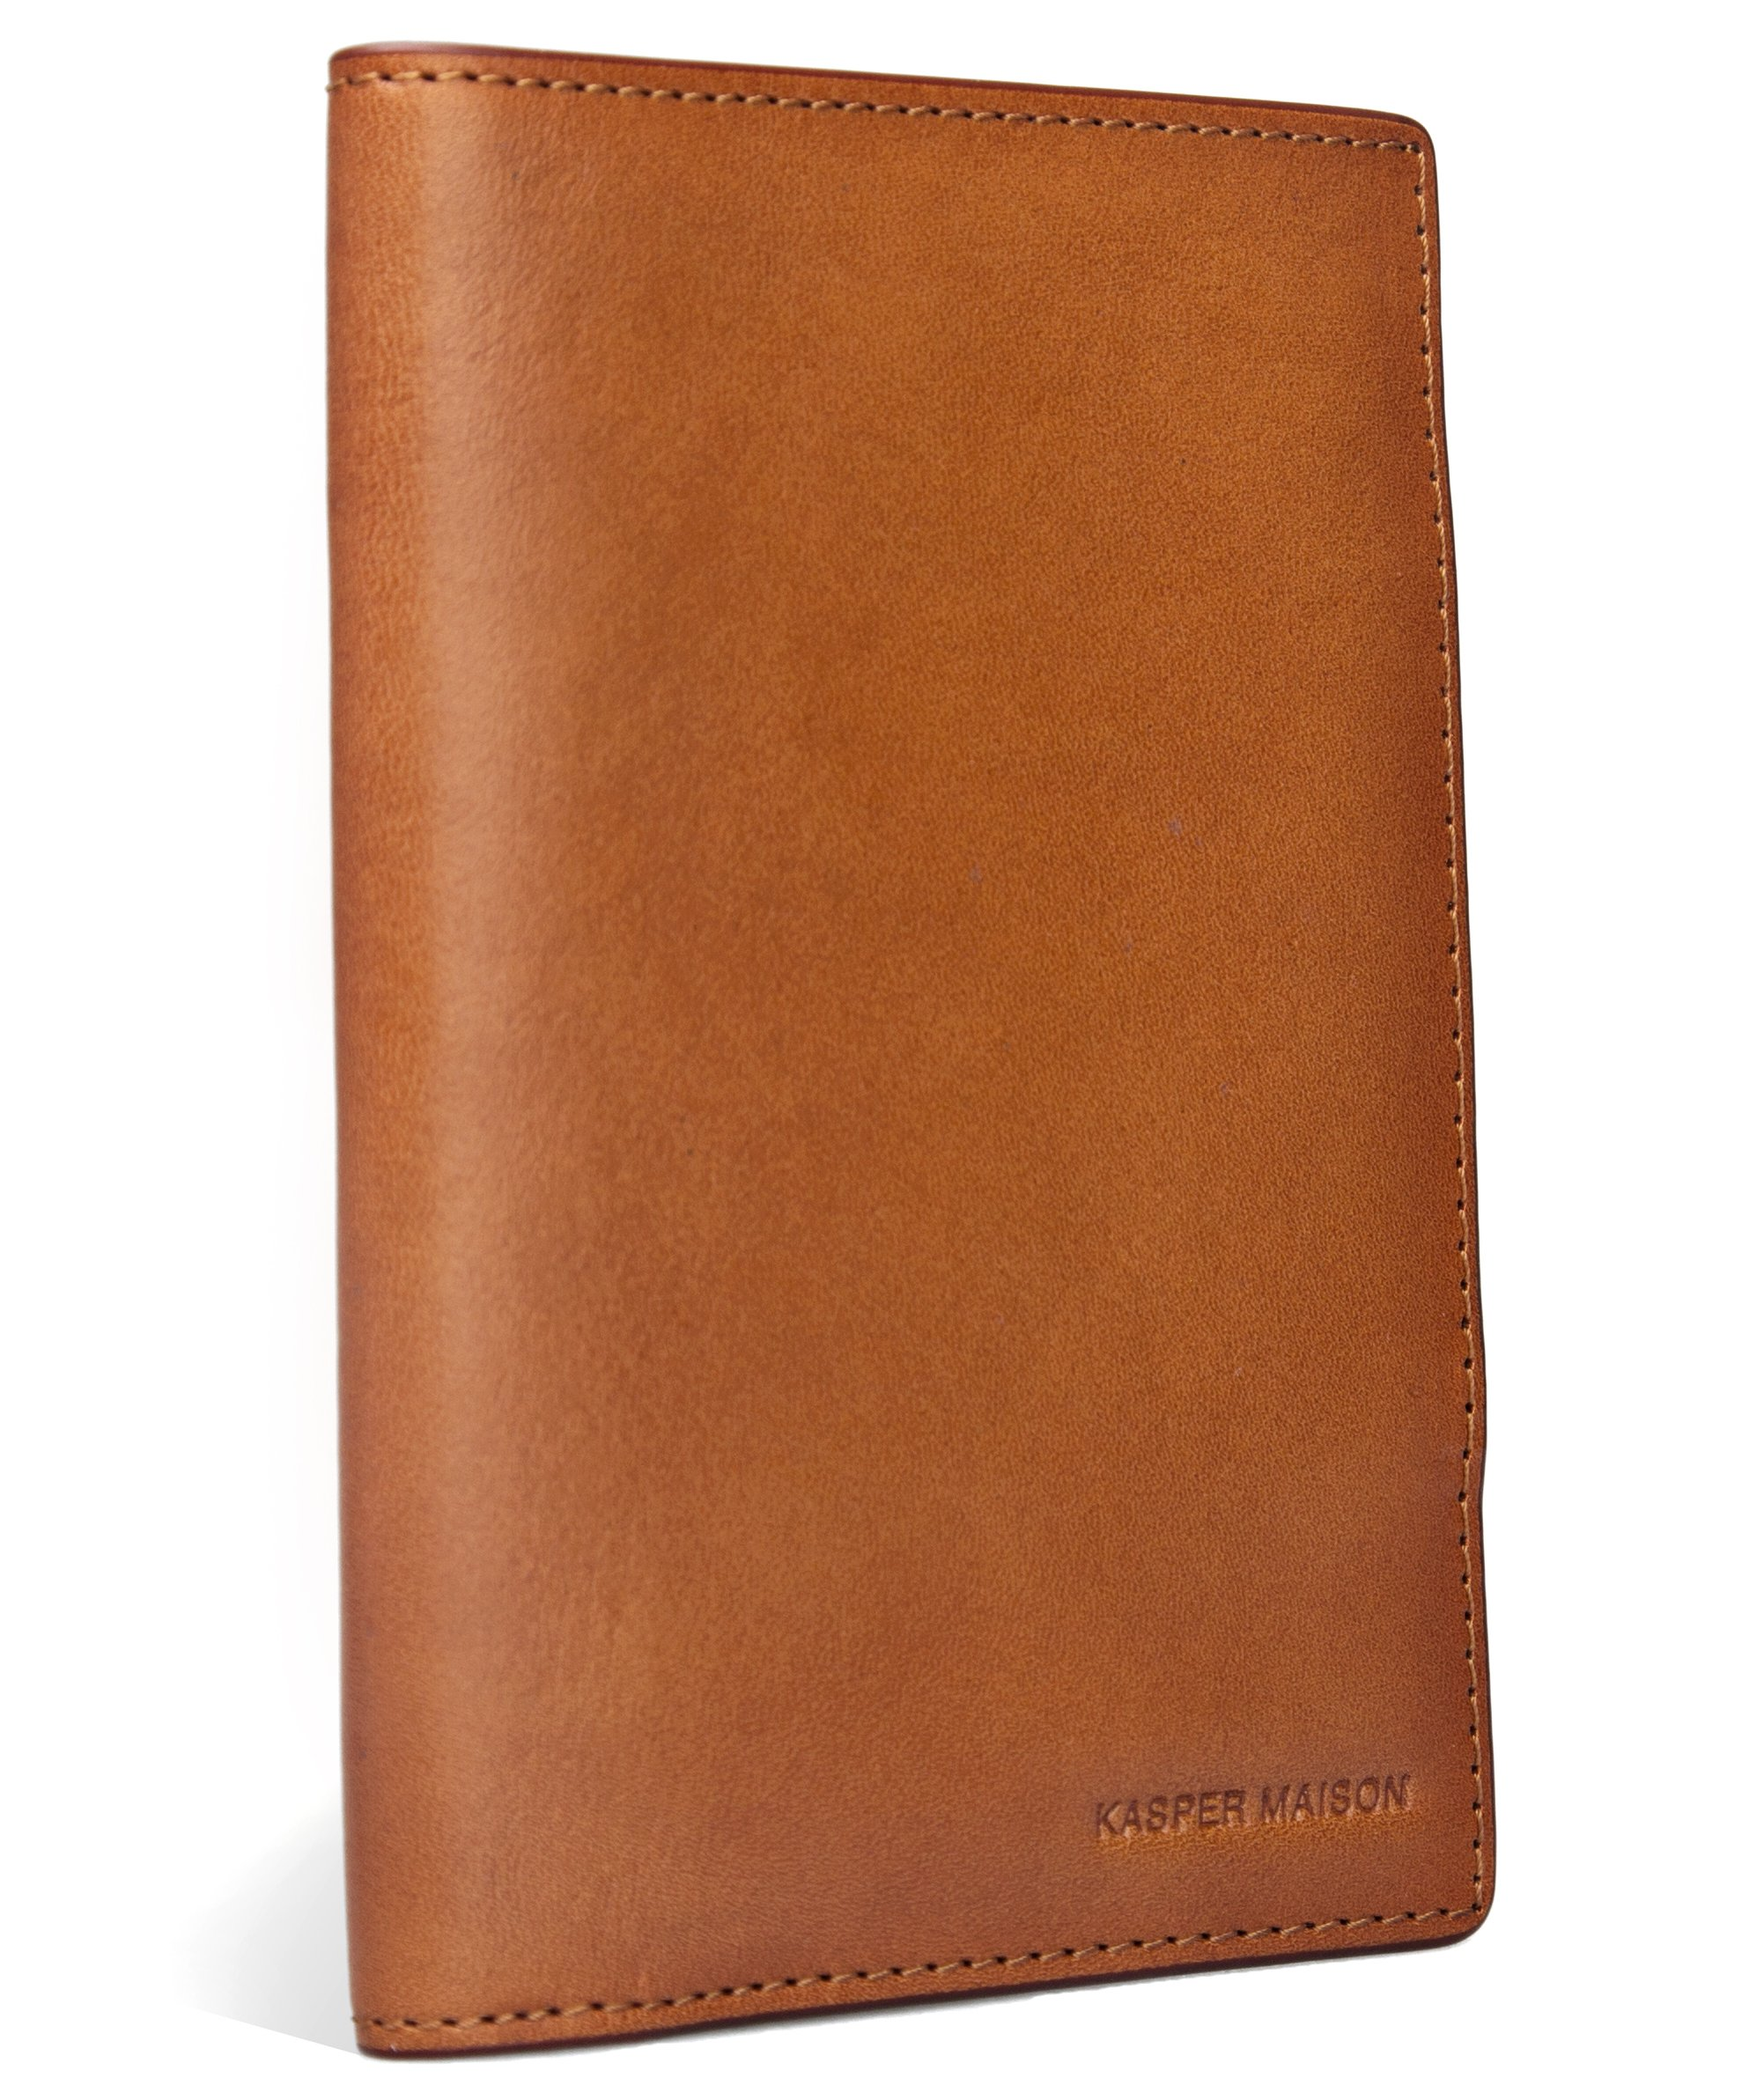 Kasper Maison Italian Leather Passport Holder - Travel Document Case with anti theft RFID Blocking - Signature Gift included by Kasper Maison